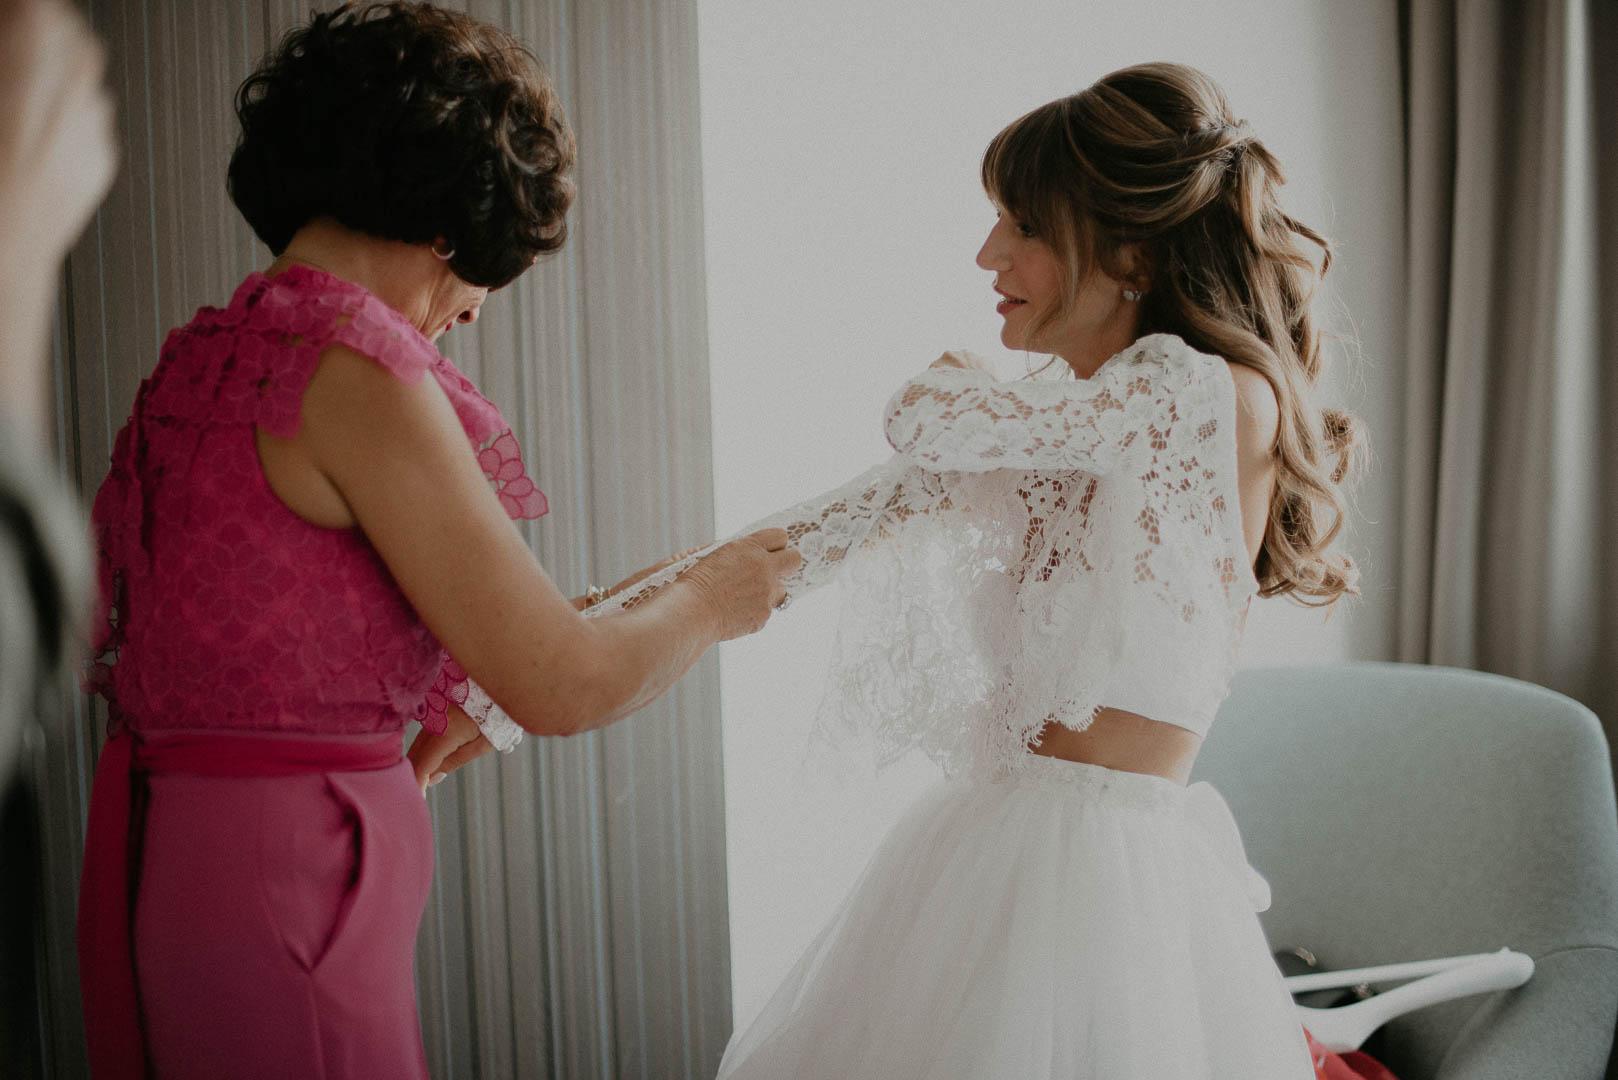 wedding-photographer-destination-fineart-bespoke-reportage-napoli-nabilah-vivianeizzo-spazio46-40